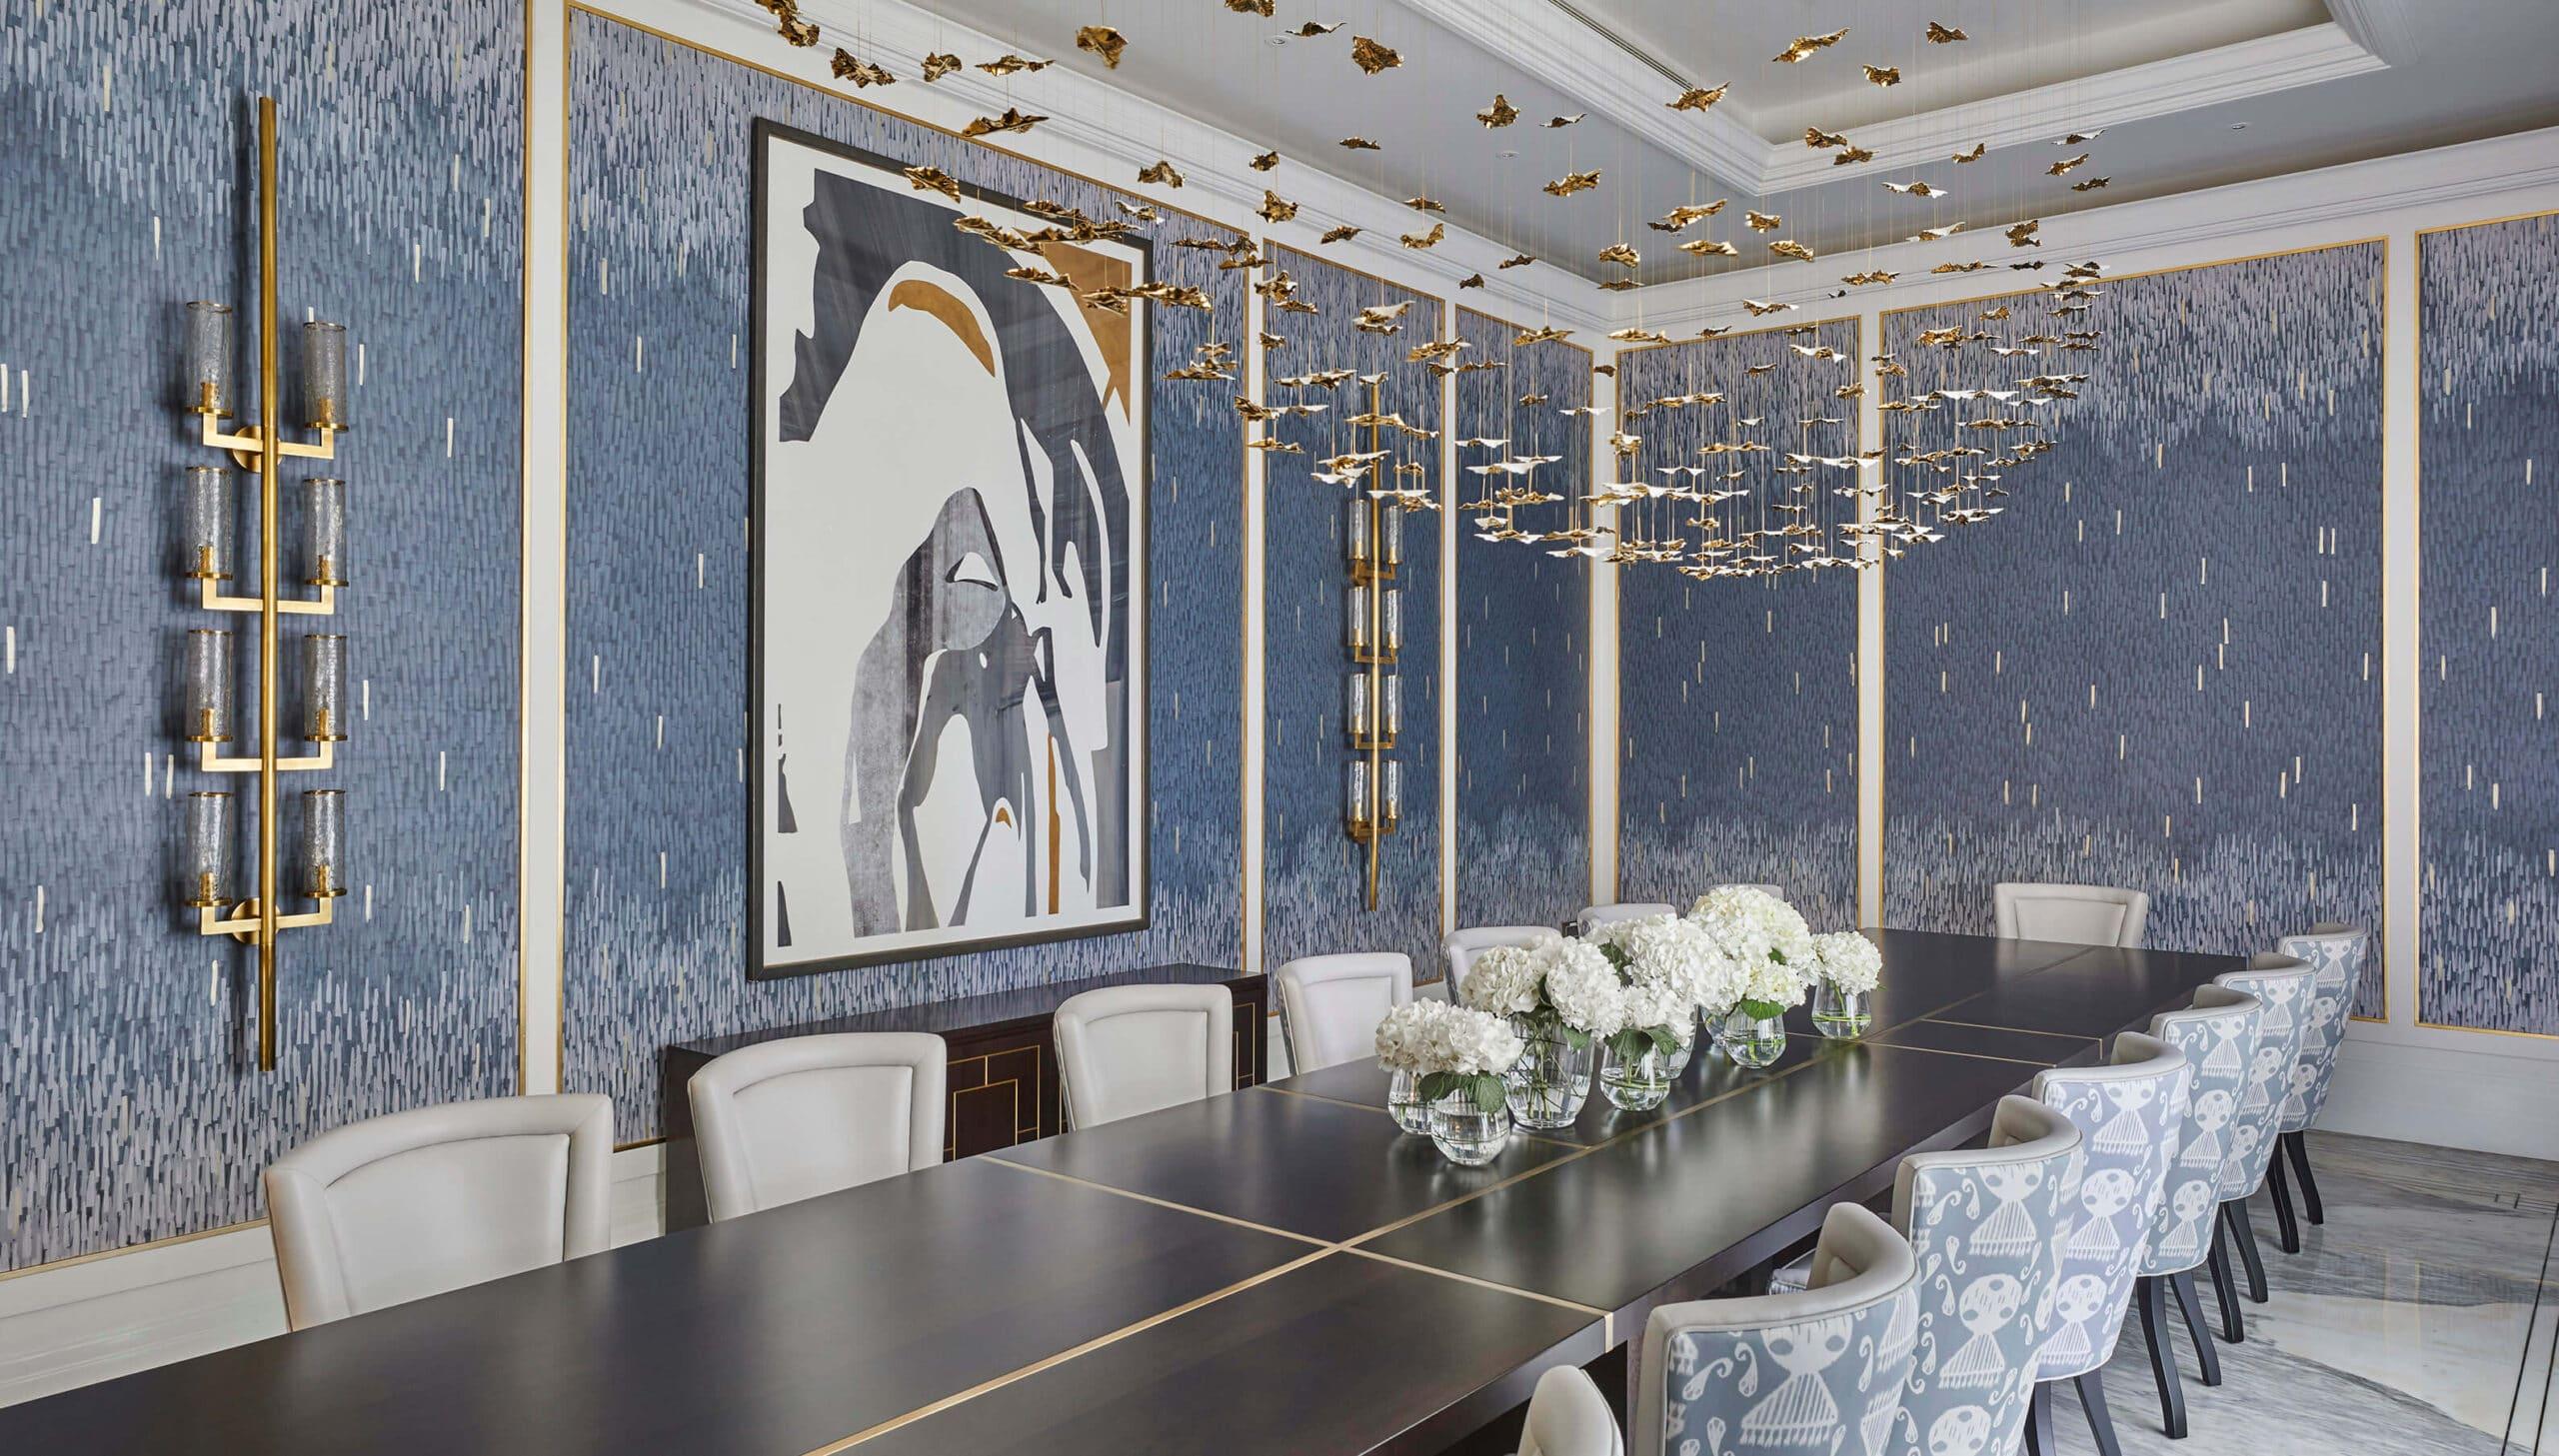 doha pearl villa interior design project by Katharine Pooley